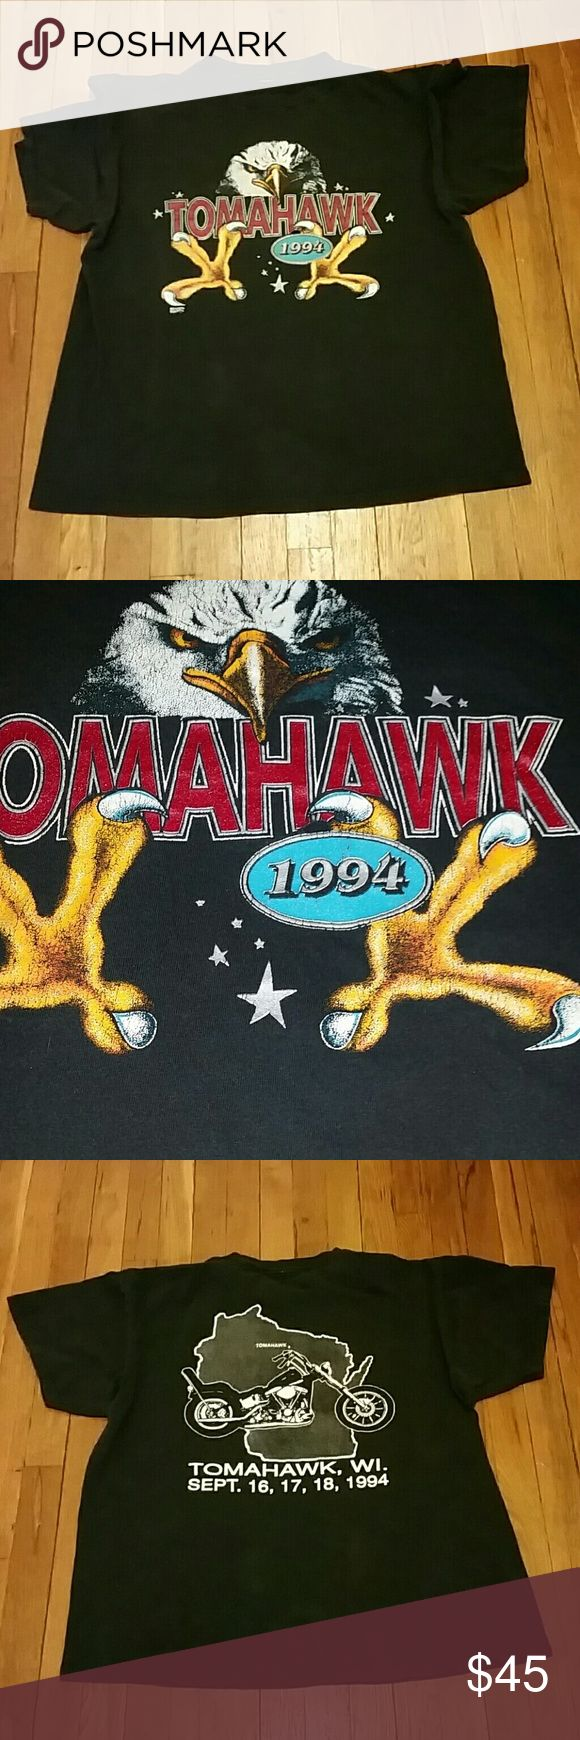 TOMAHAWK 1994 T-shirt Size men's xl/ Ladies xxl MID FLORIDA SPORTS . Tiny holes near top eagle claws. MID FLORIDA SPORTS Shirts Tees - Short Sleeve